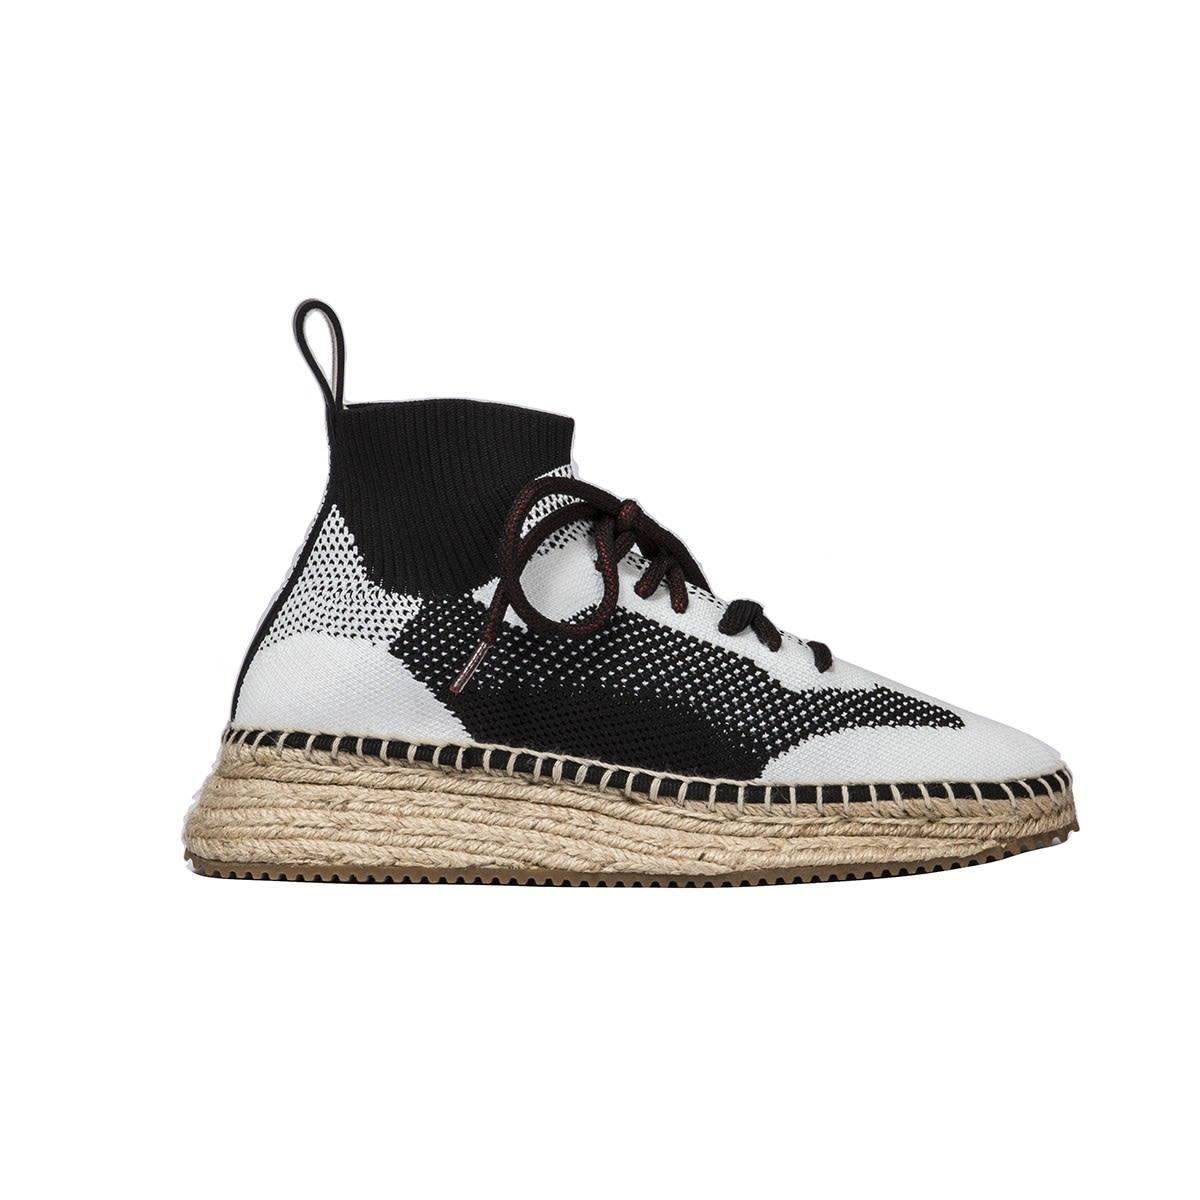 ee2cdcd5b5e7  Valentines  AdoreWe  Italist -  Alexander Wang Dakota Knit Shoes -  AdoreWe.com